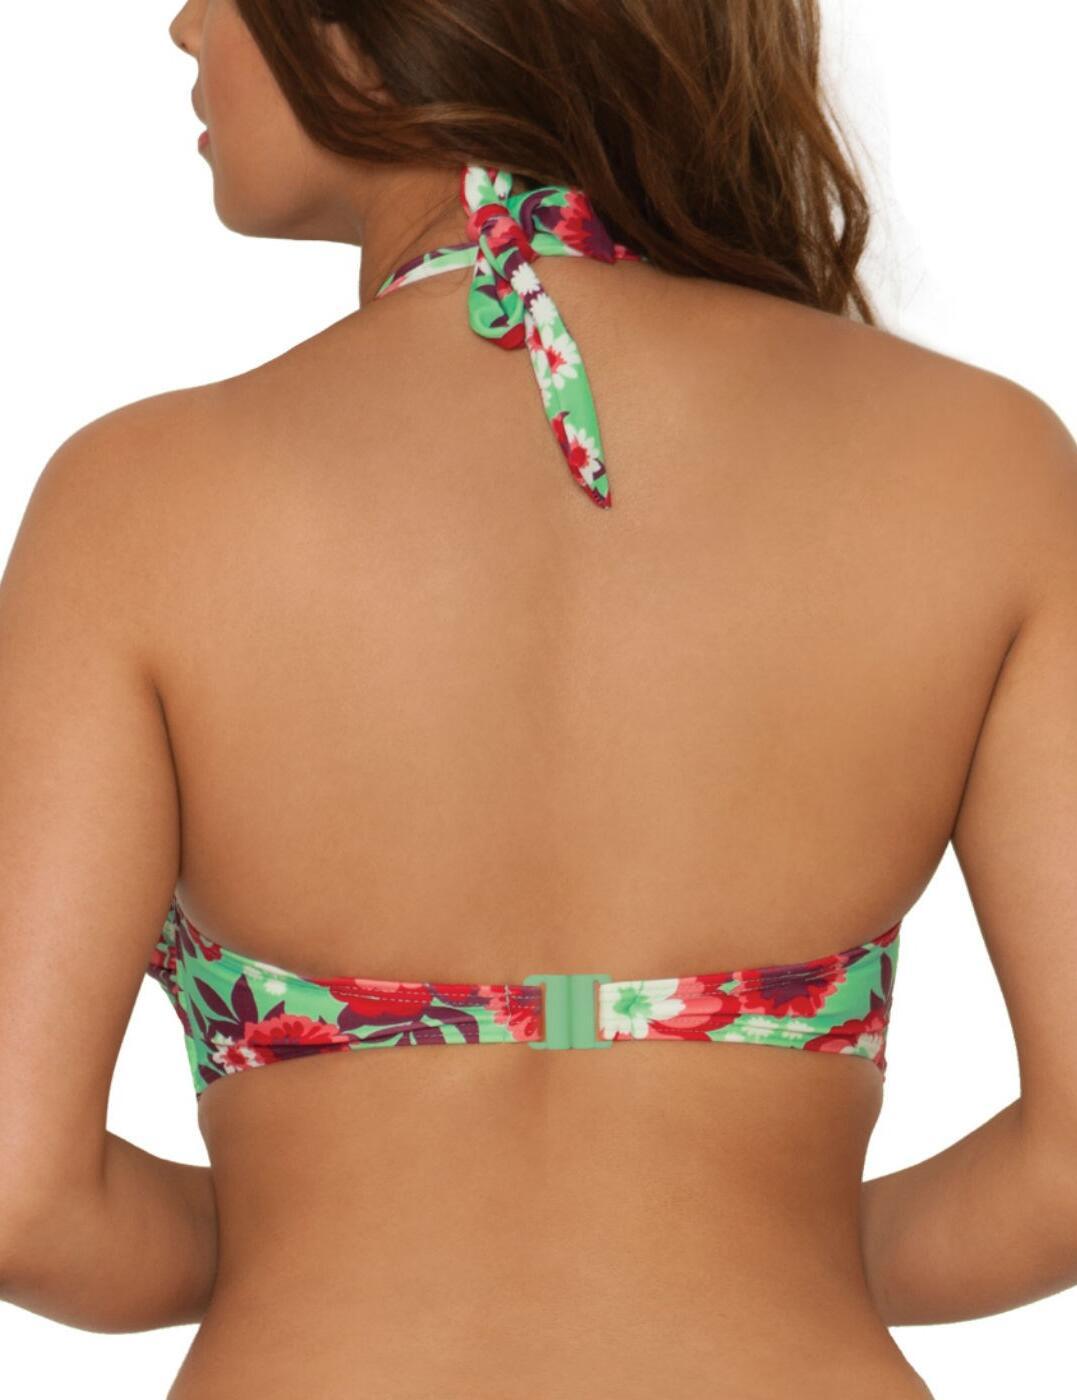 Curvy Kate CS3041 Aloha Bandeau Bikini Top in Sea Foam